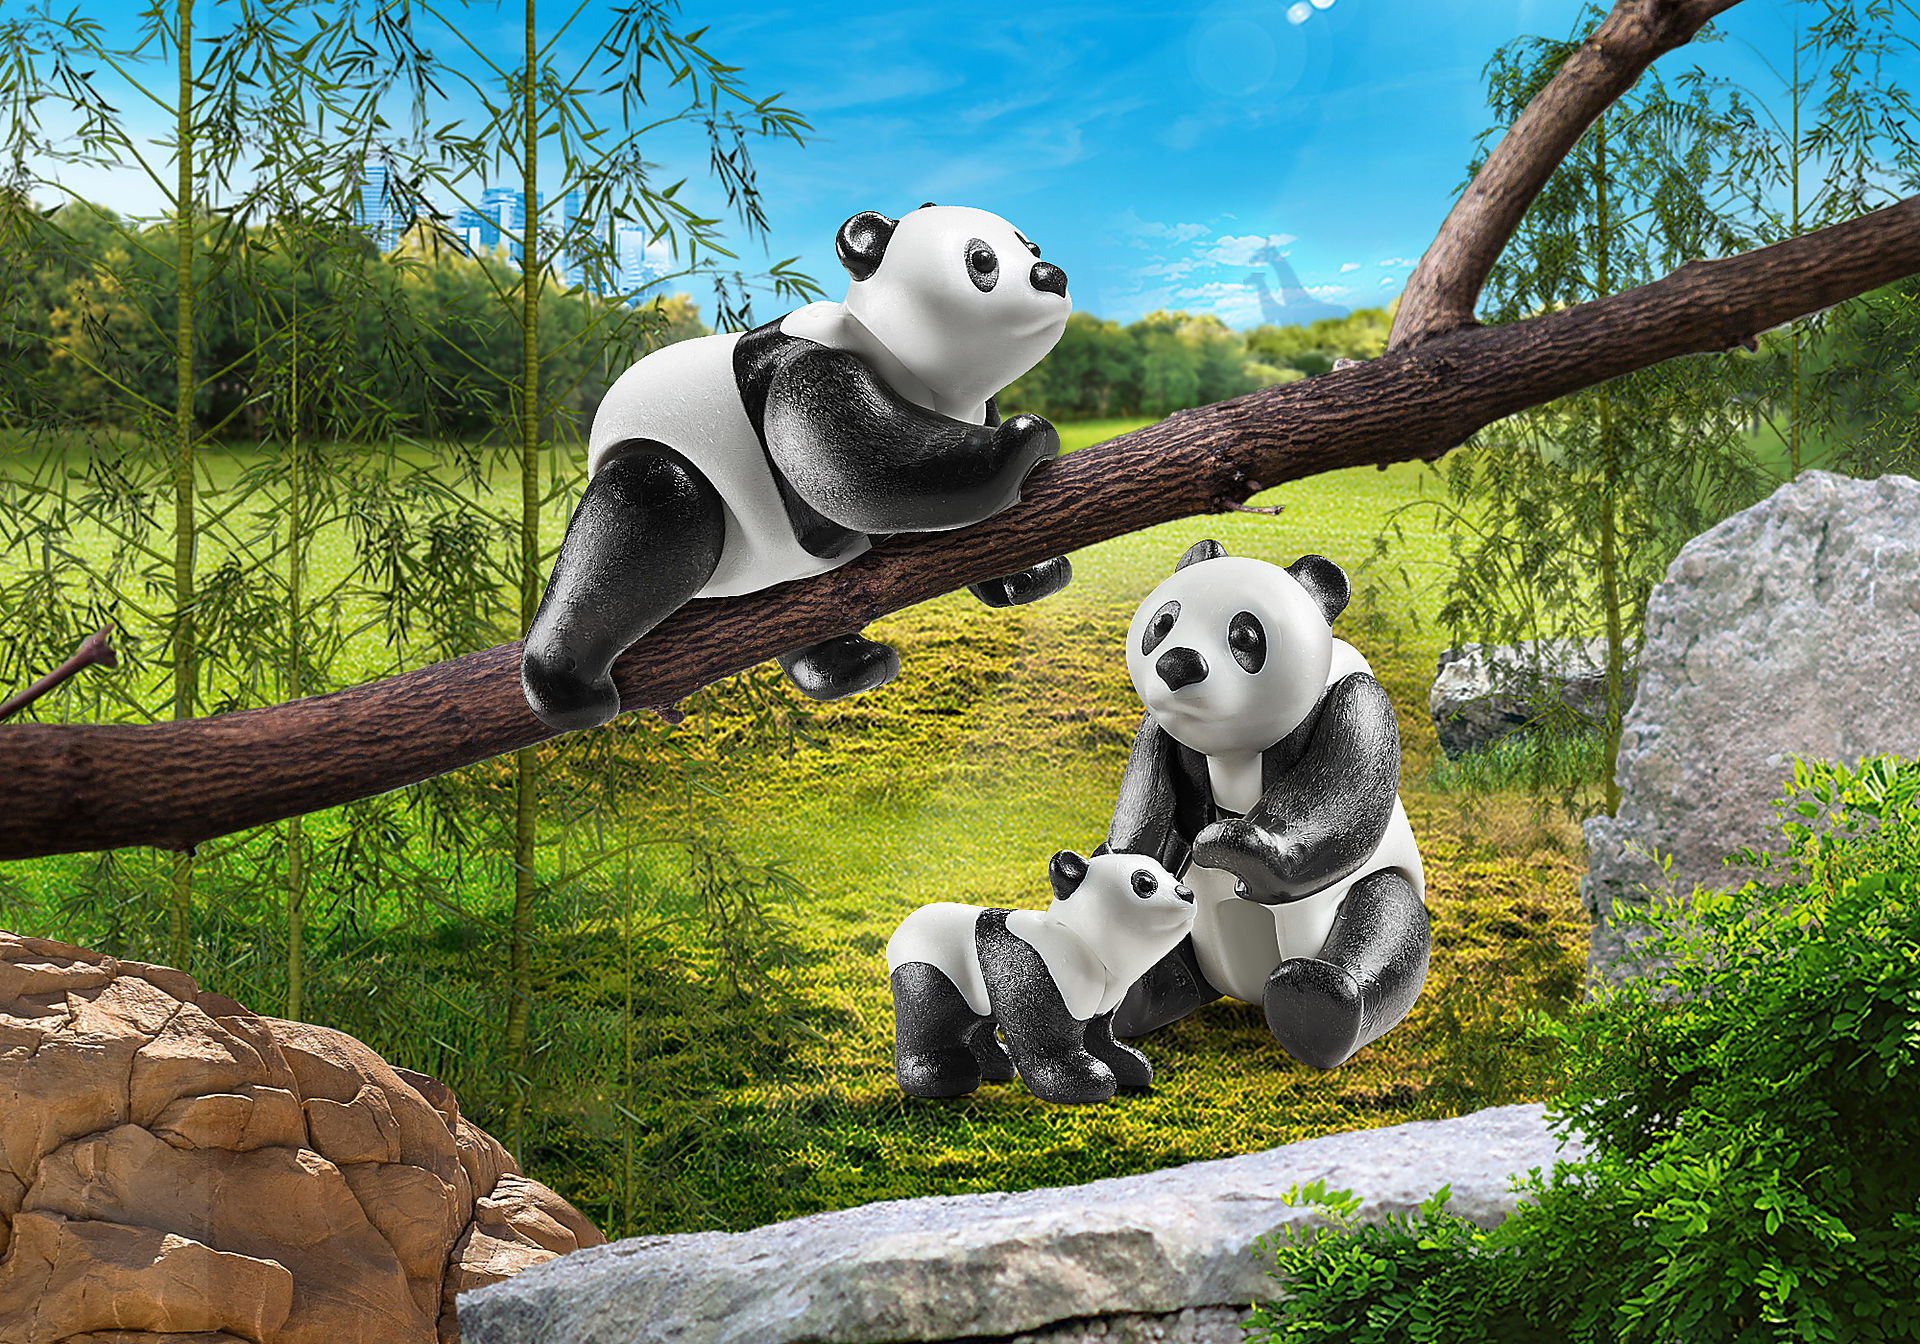 70353 Pandas with Cub zoom image1